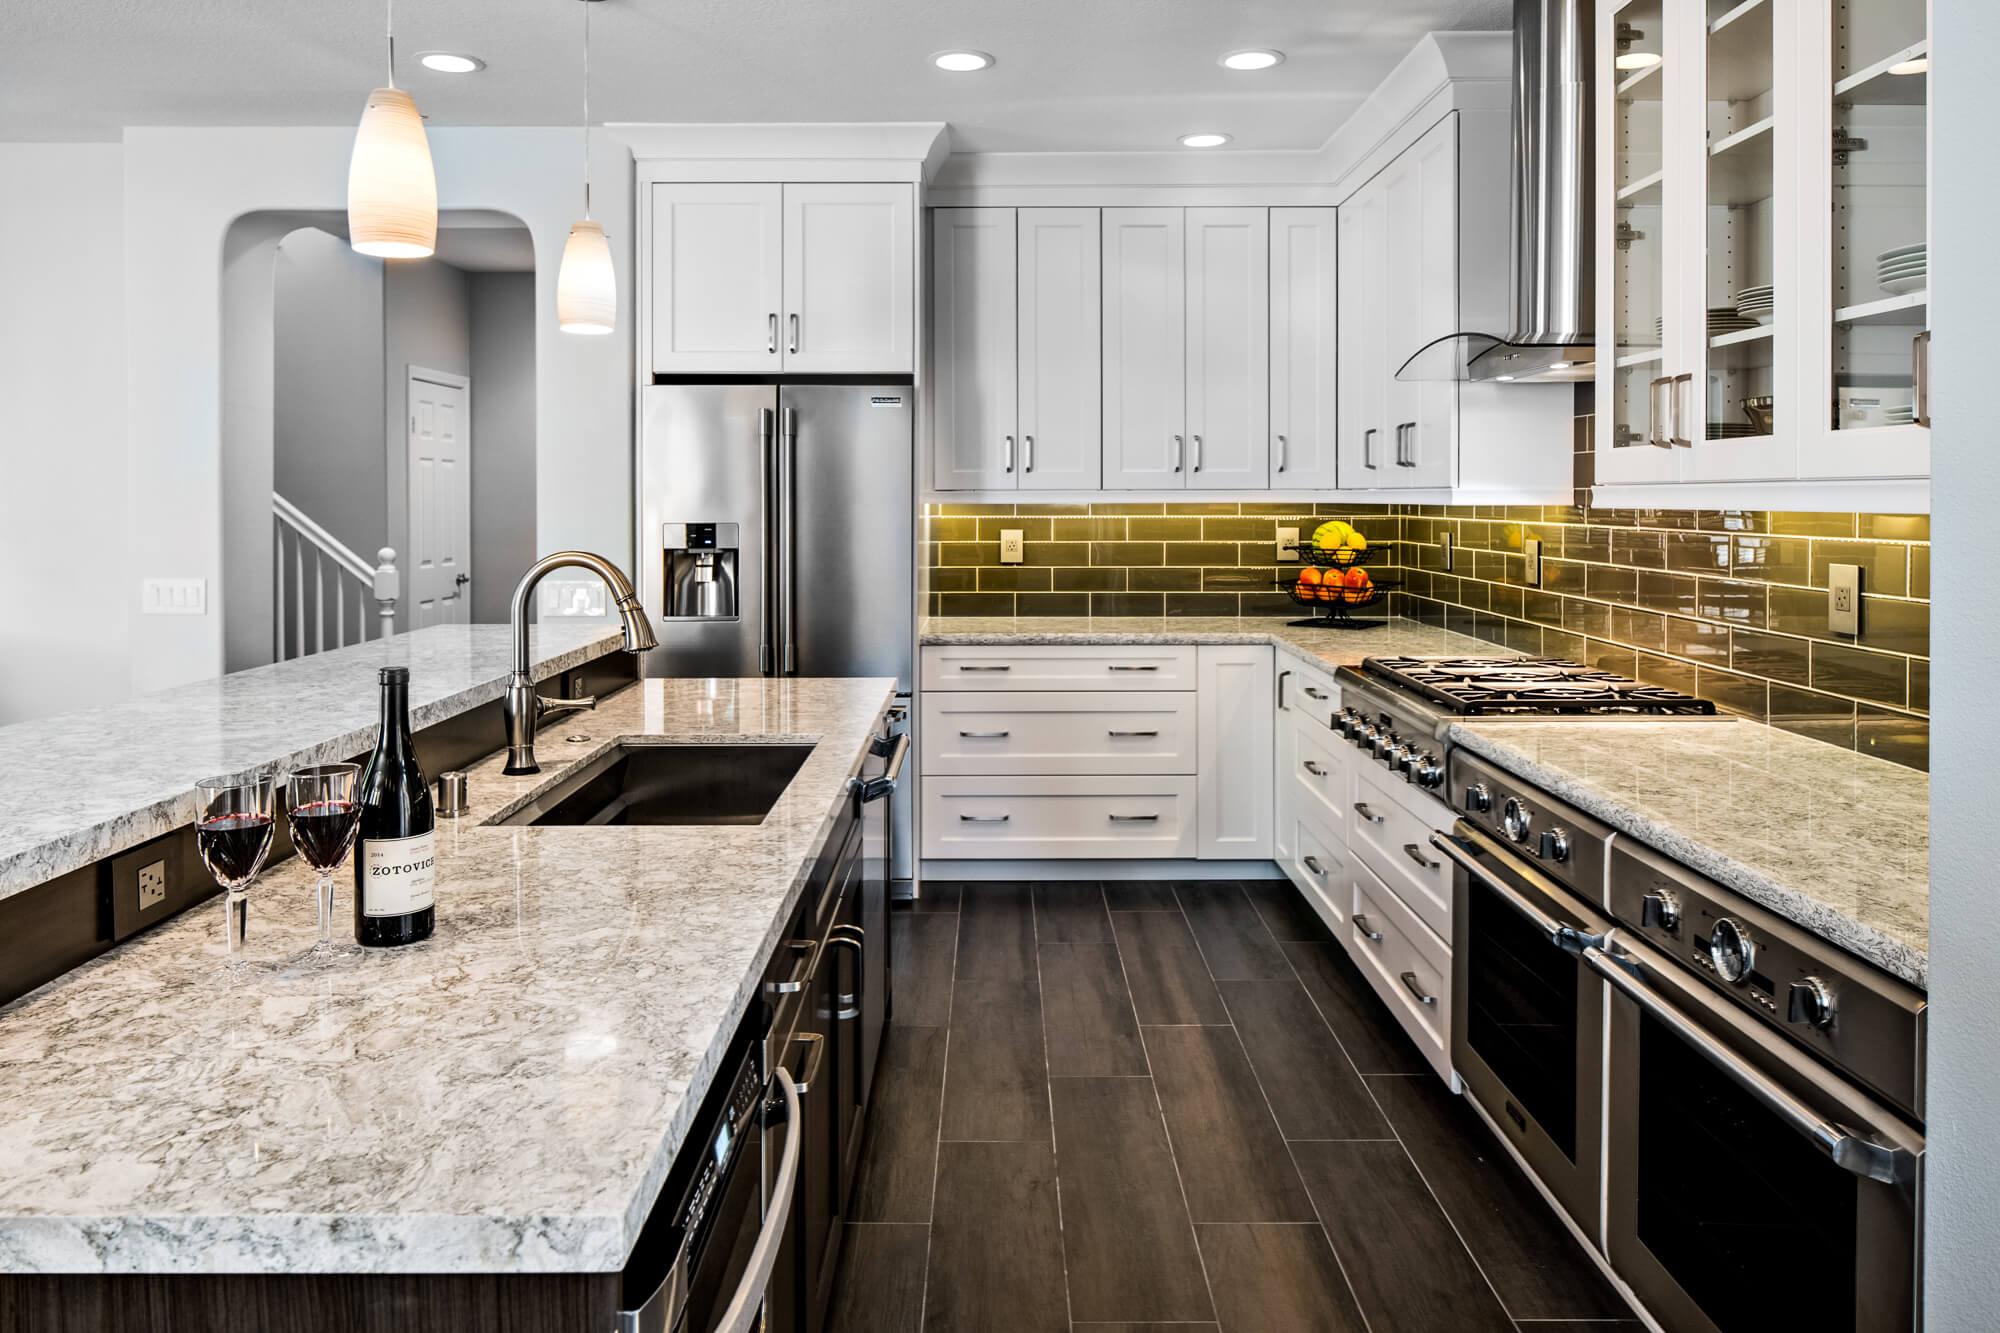 Two Toned Kitchen Back Splash, Subway Tile Backsplash, Orange County Kitchen Remodel